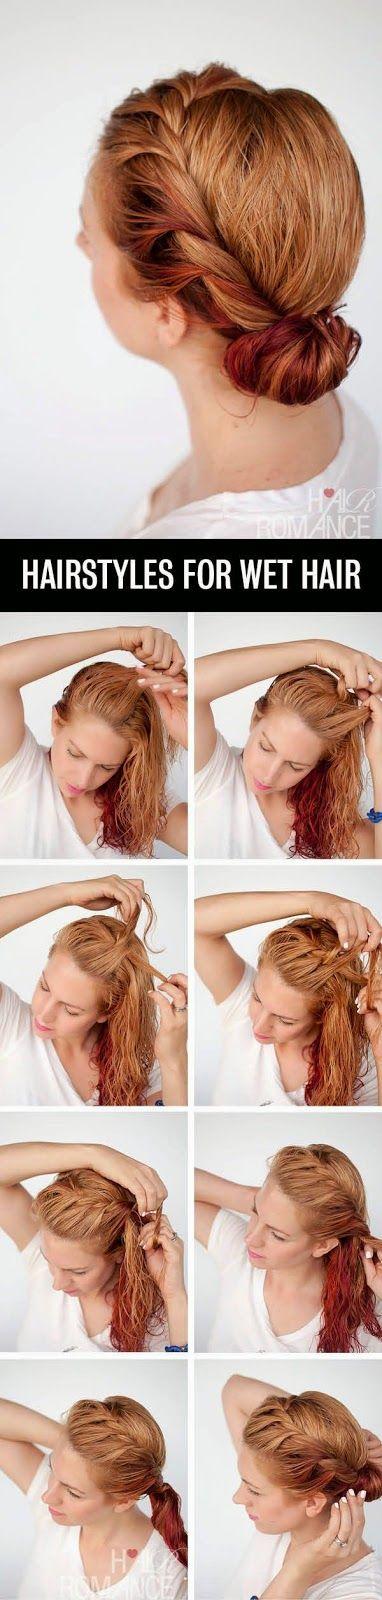 Hairstyles For Wet Hair | Medi Villas